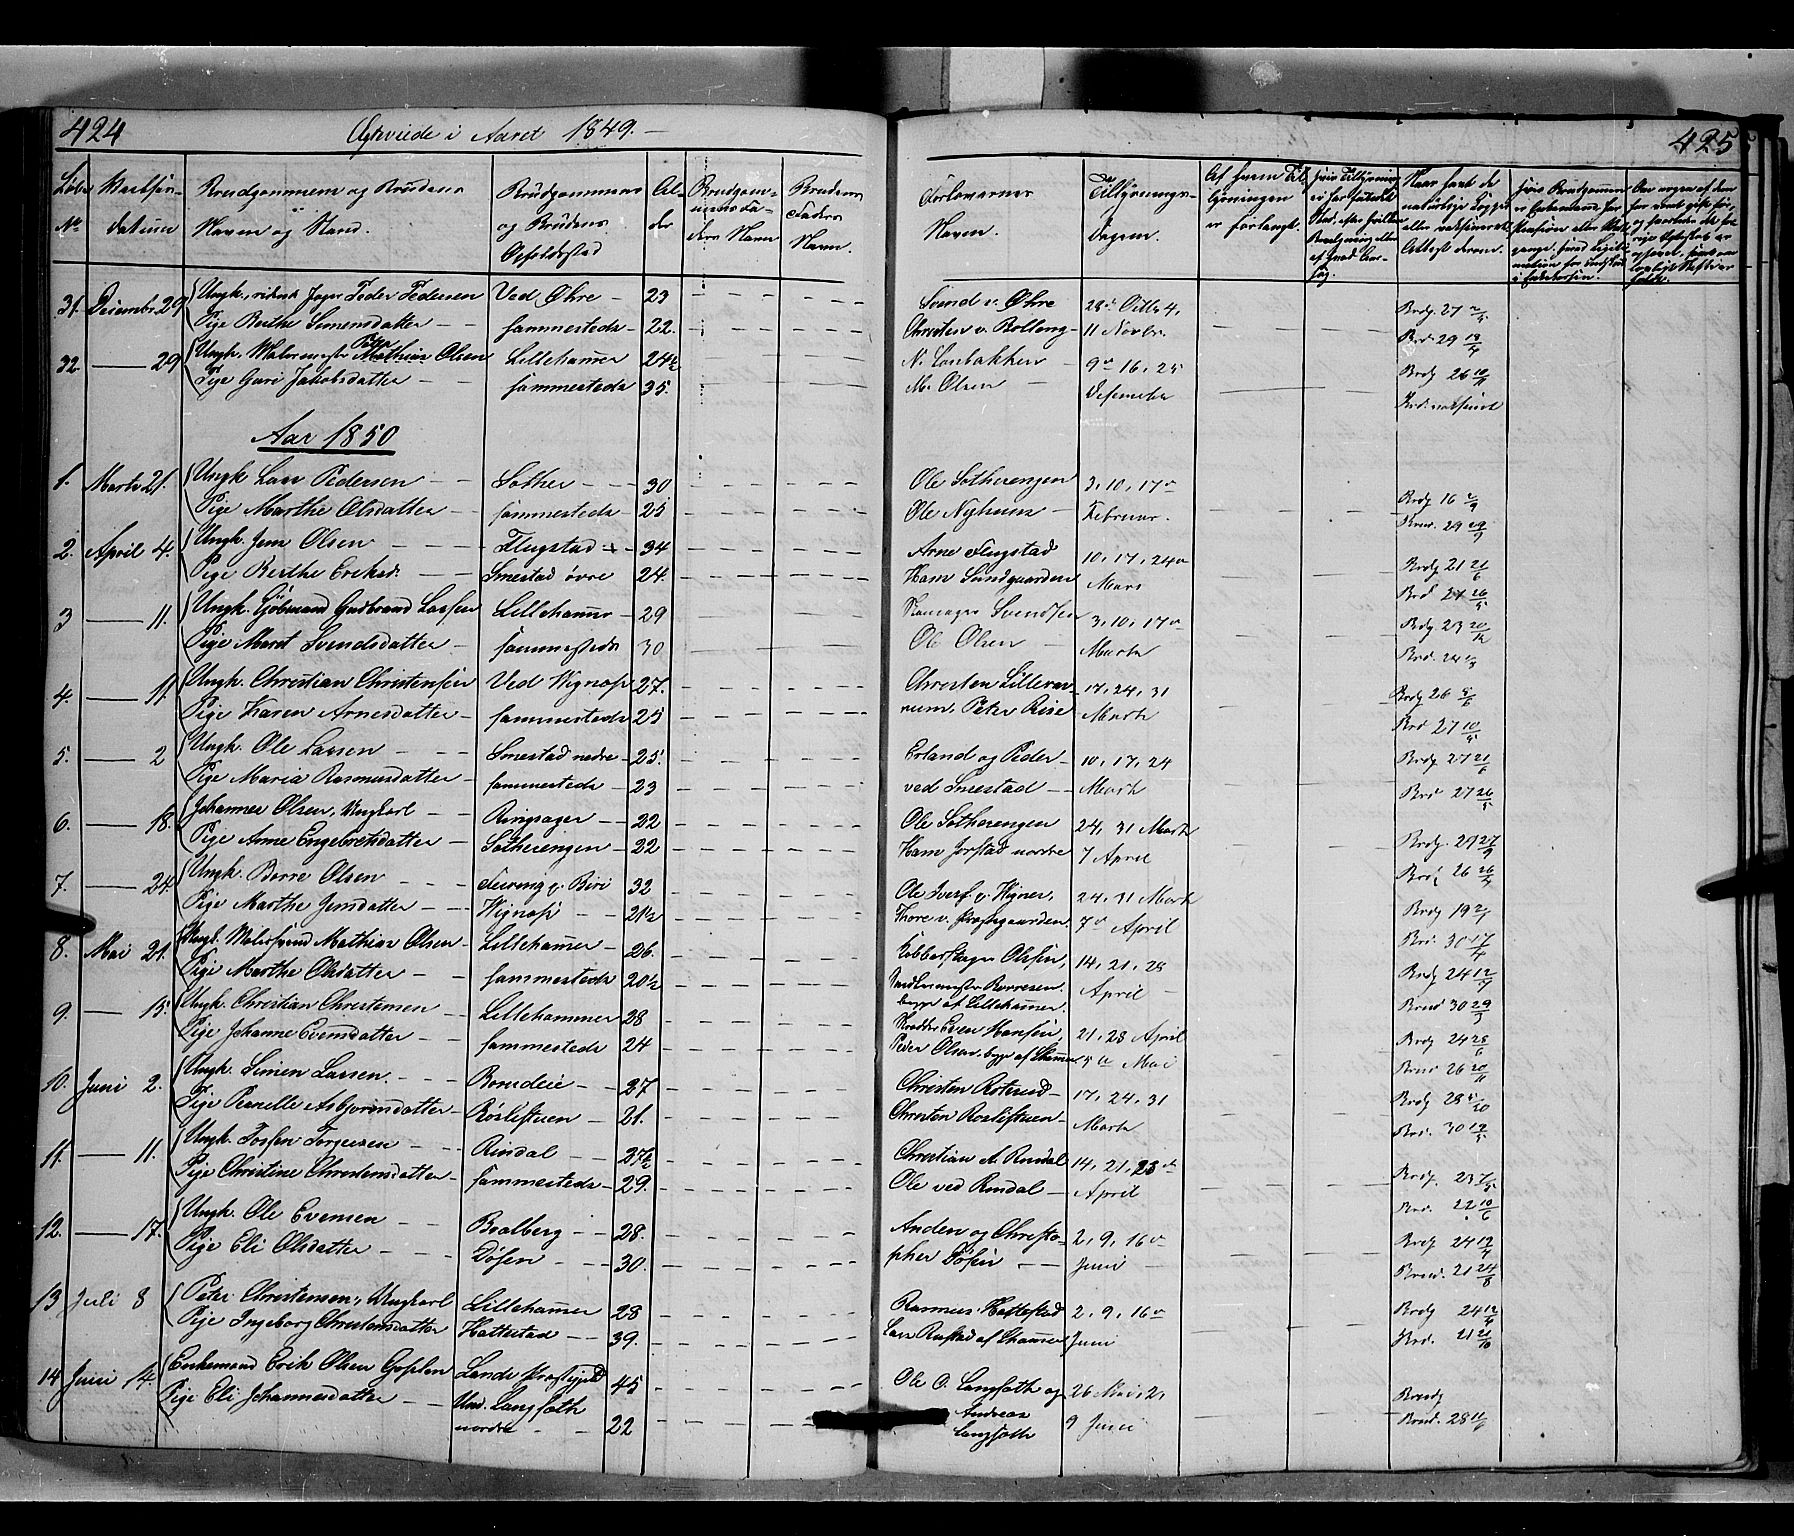 SAH, Fåberg prestekontor, Klokkerbok nr. 6, 1837-1855, s. 424-425